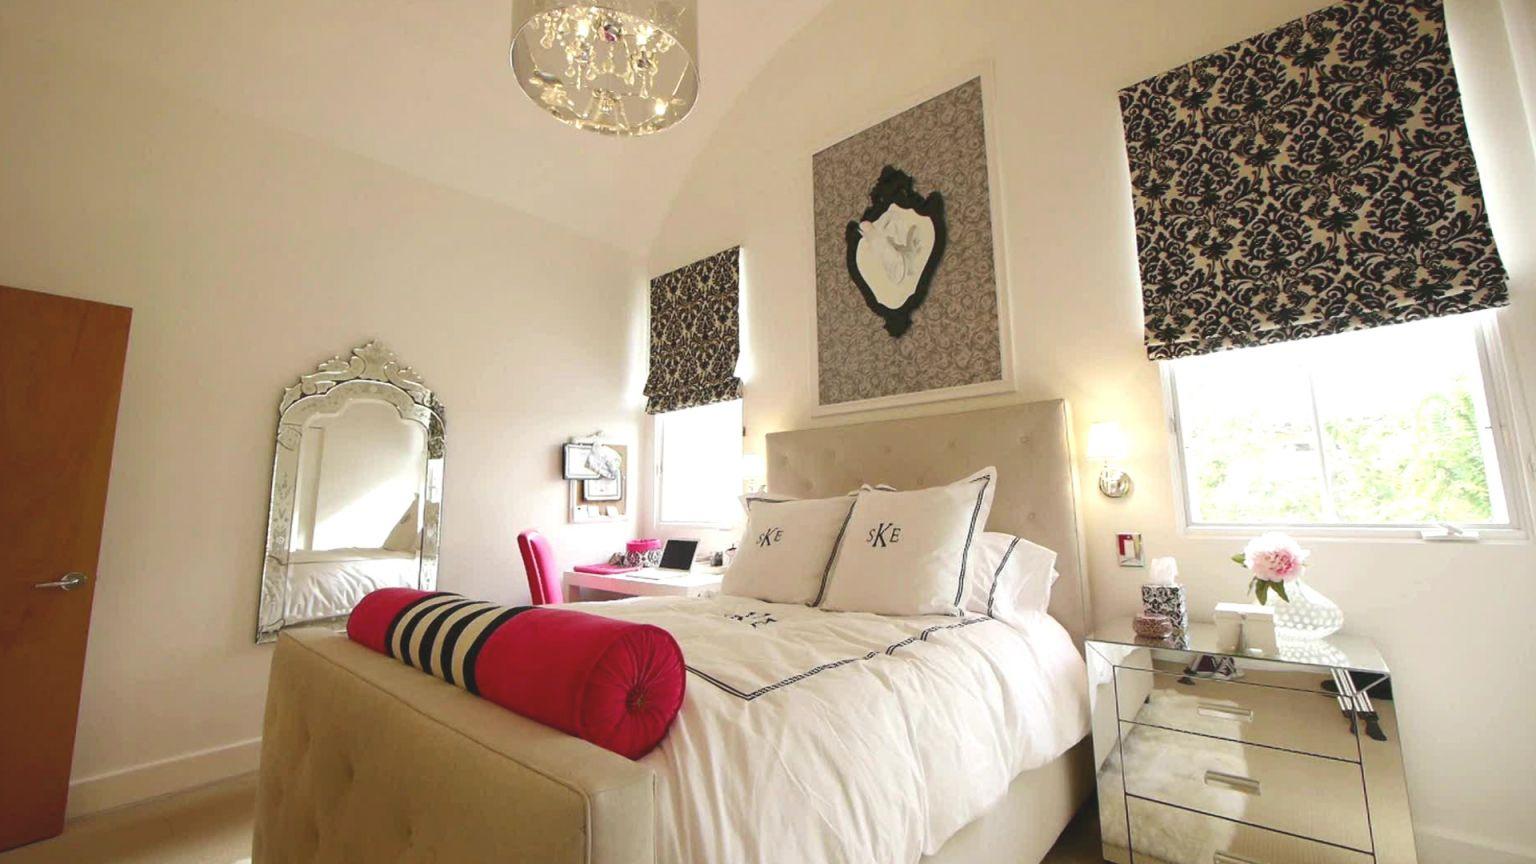 Teen Bedrooms – Ideas For Decorating Teen Rooms | Hgtv with Tween Girl Bedroom Decorating Ideas